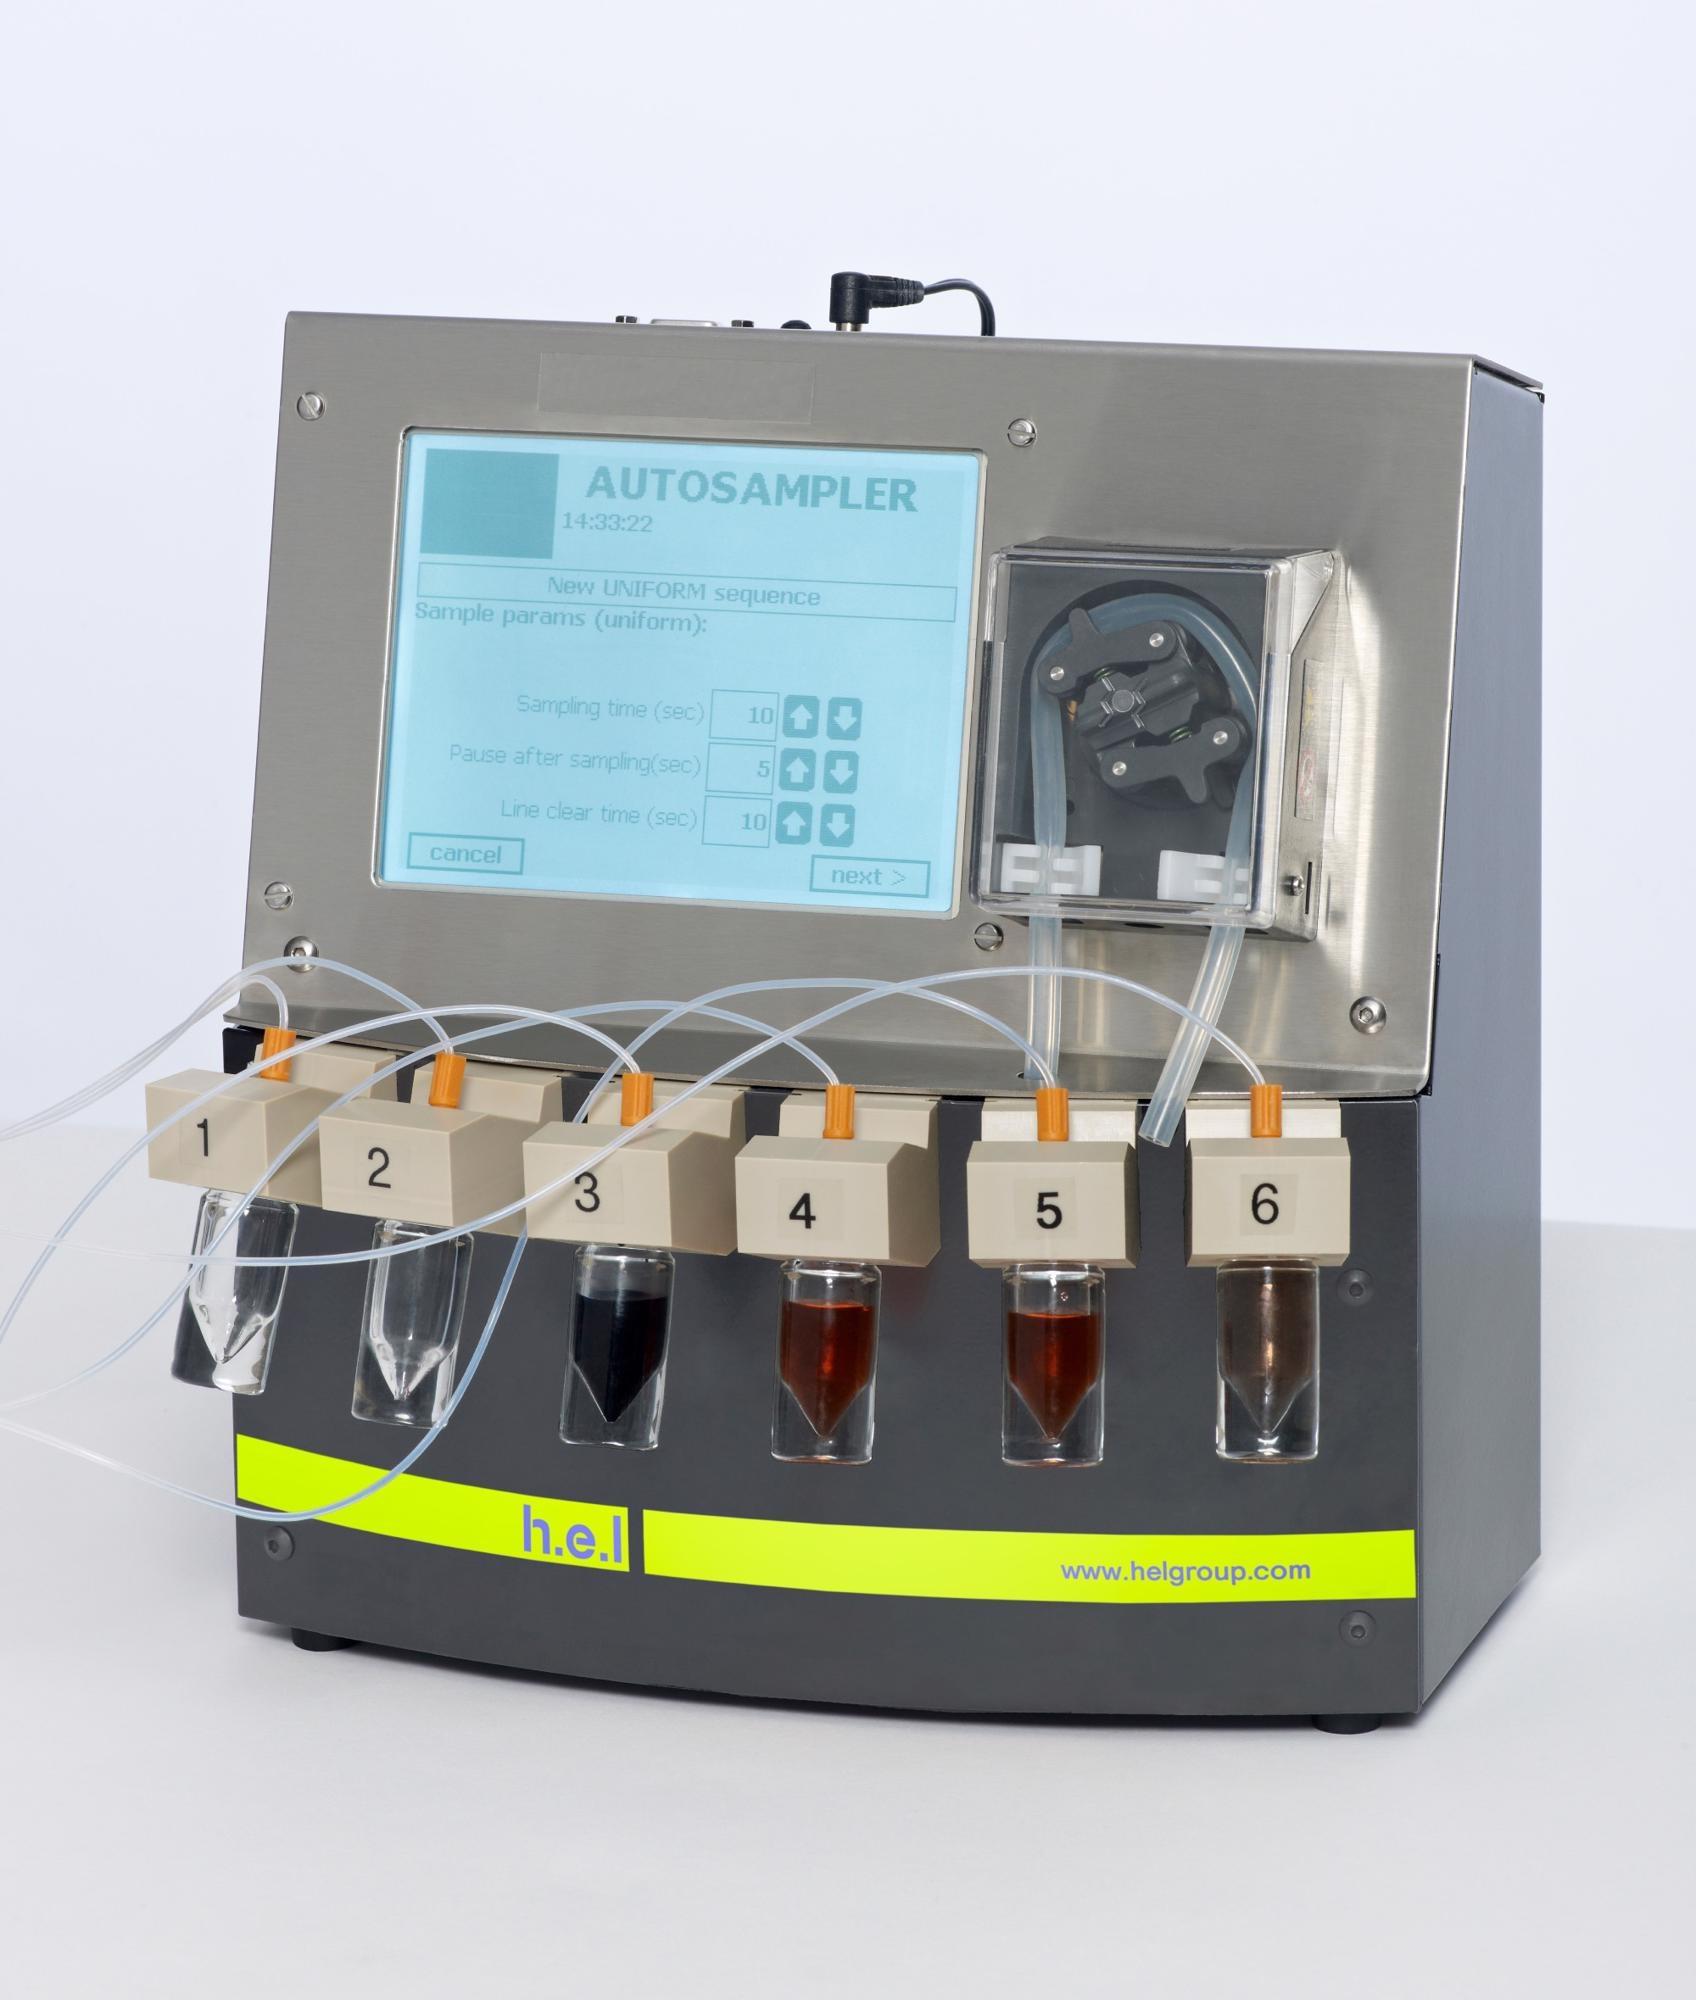 ASU: An Automated Liquid Sampling Unit